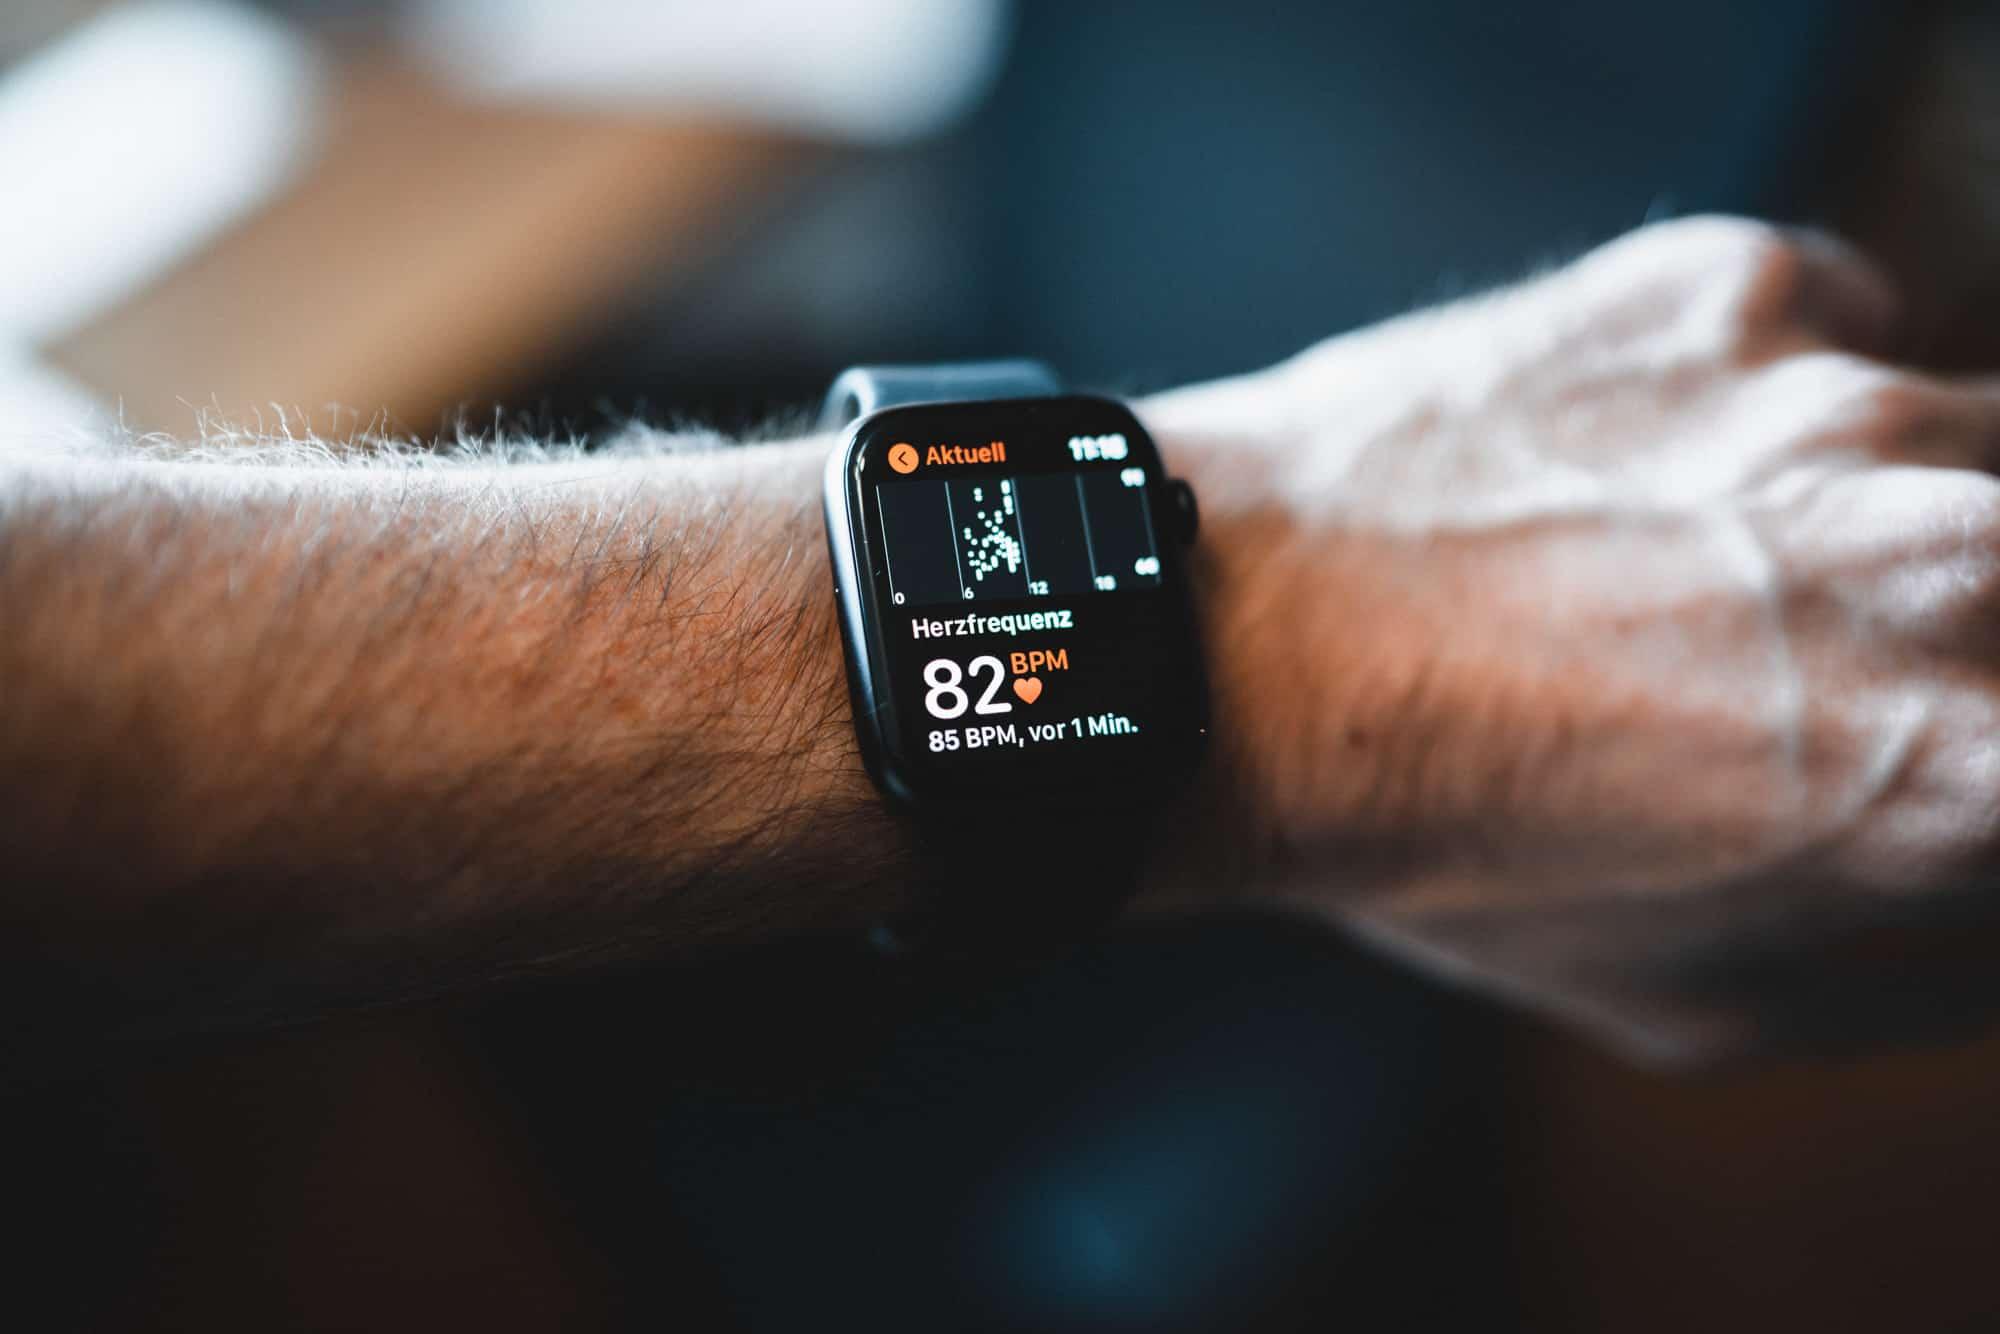 apple_watch_blutdruck_messen_02 Smart Watch Zucker Messen